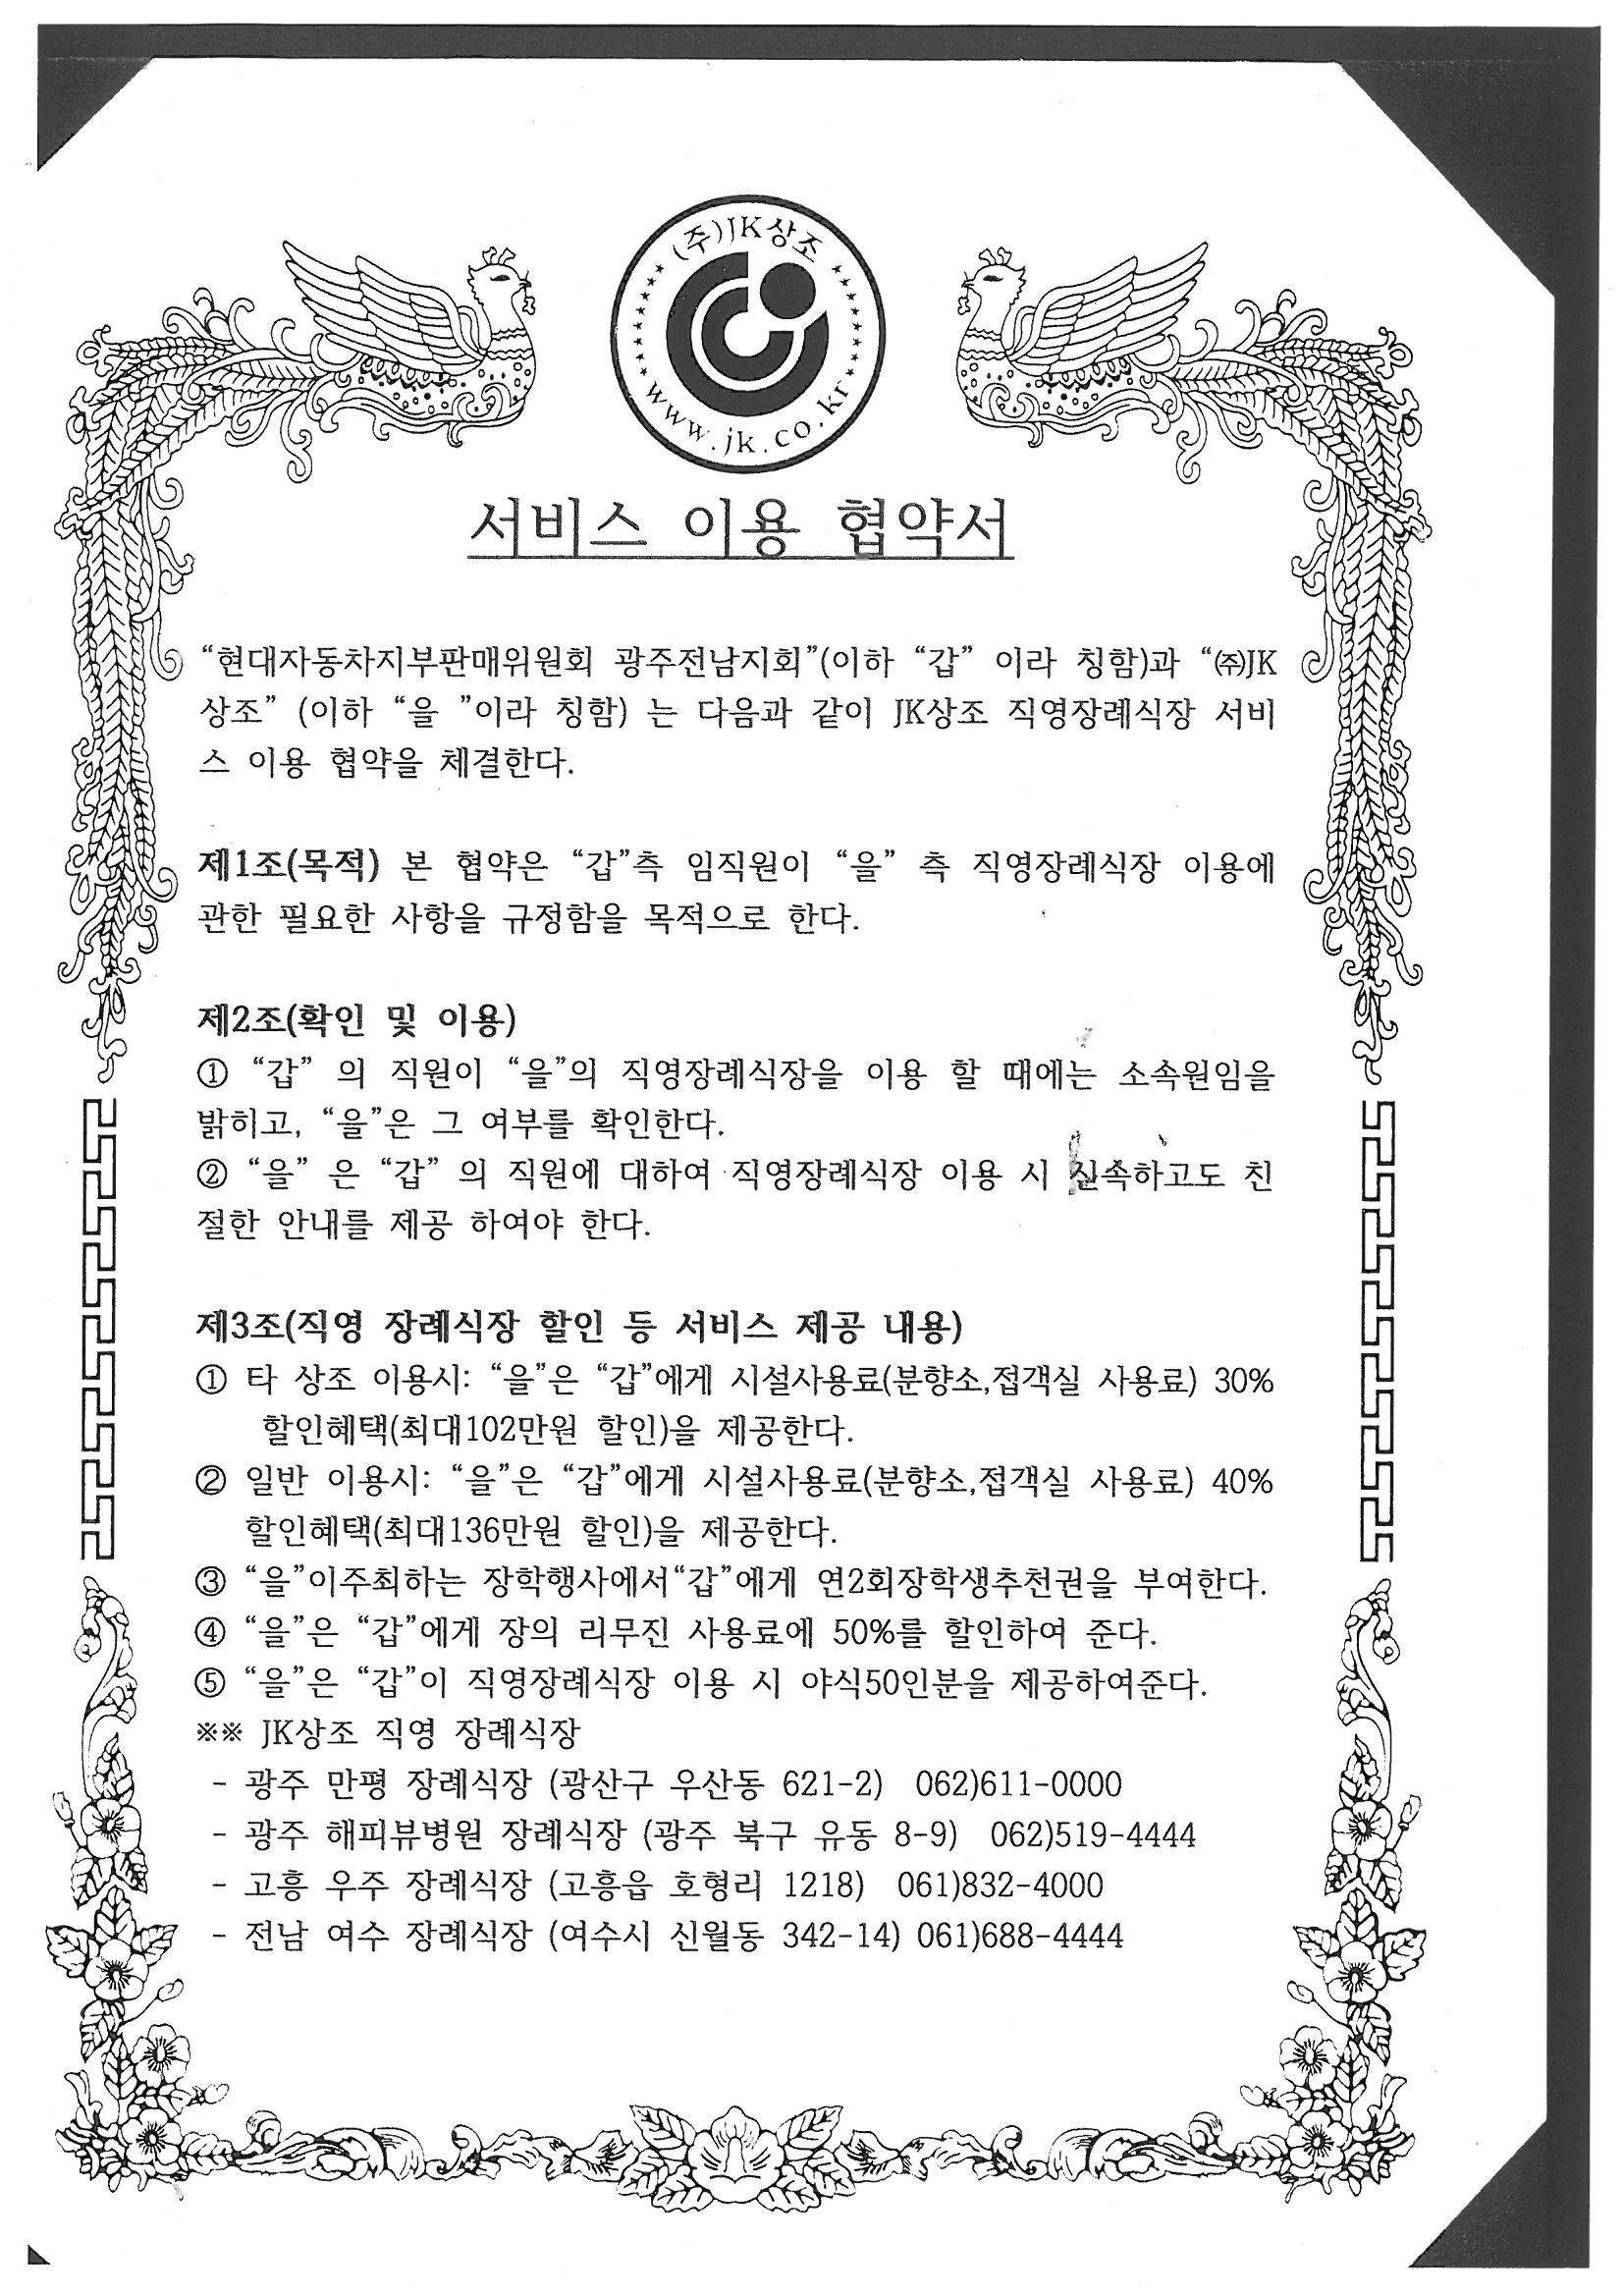 JK직영(만평,해피뷰,고흥우주,전남여수)1.jpg